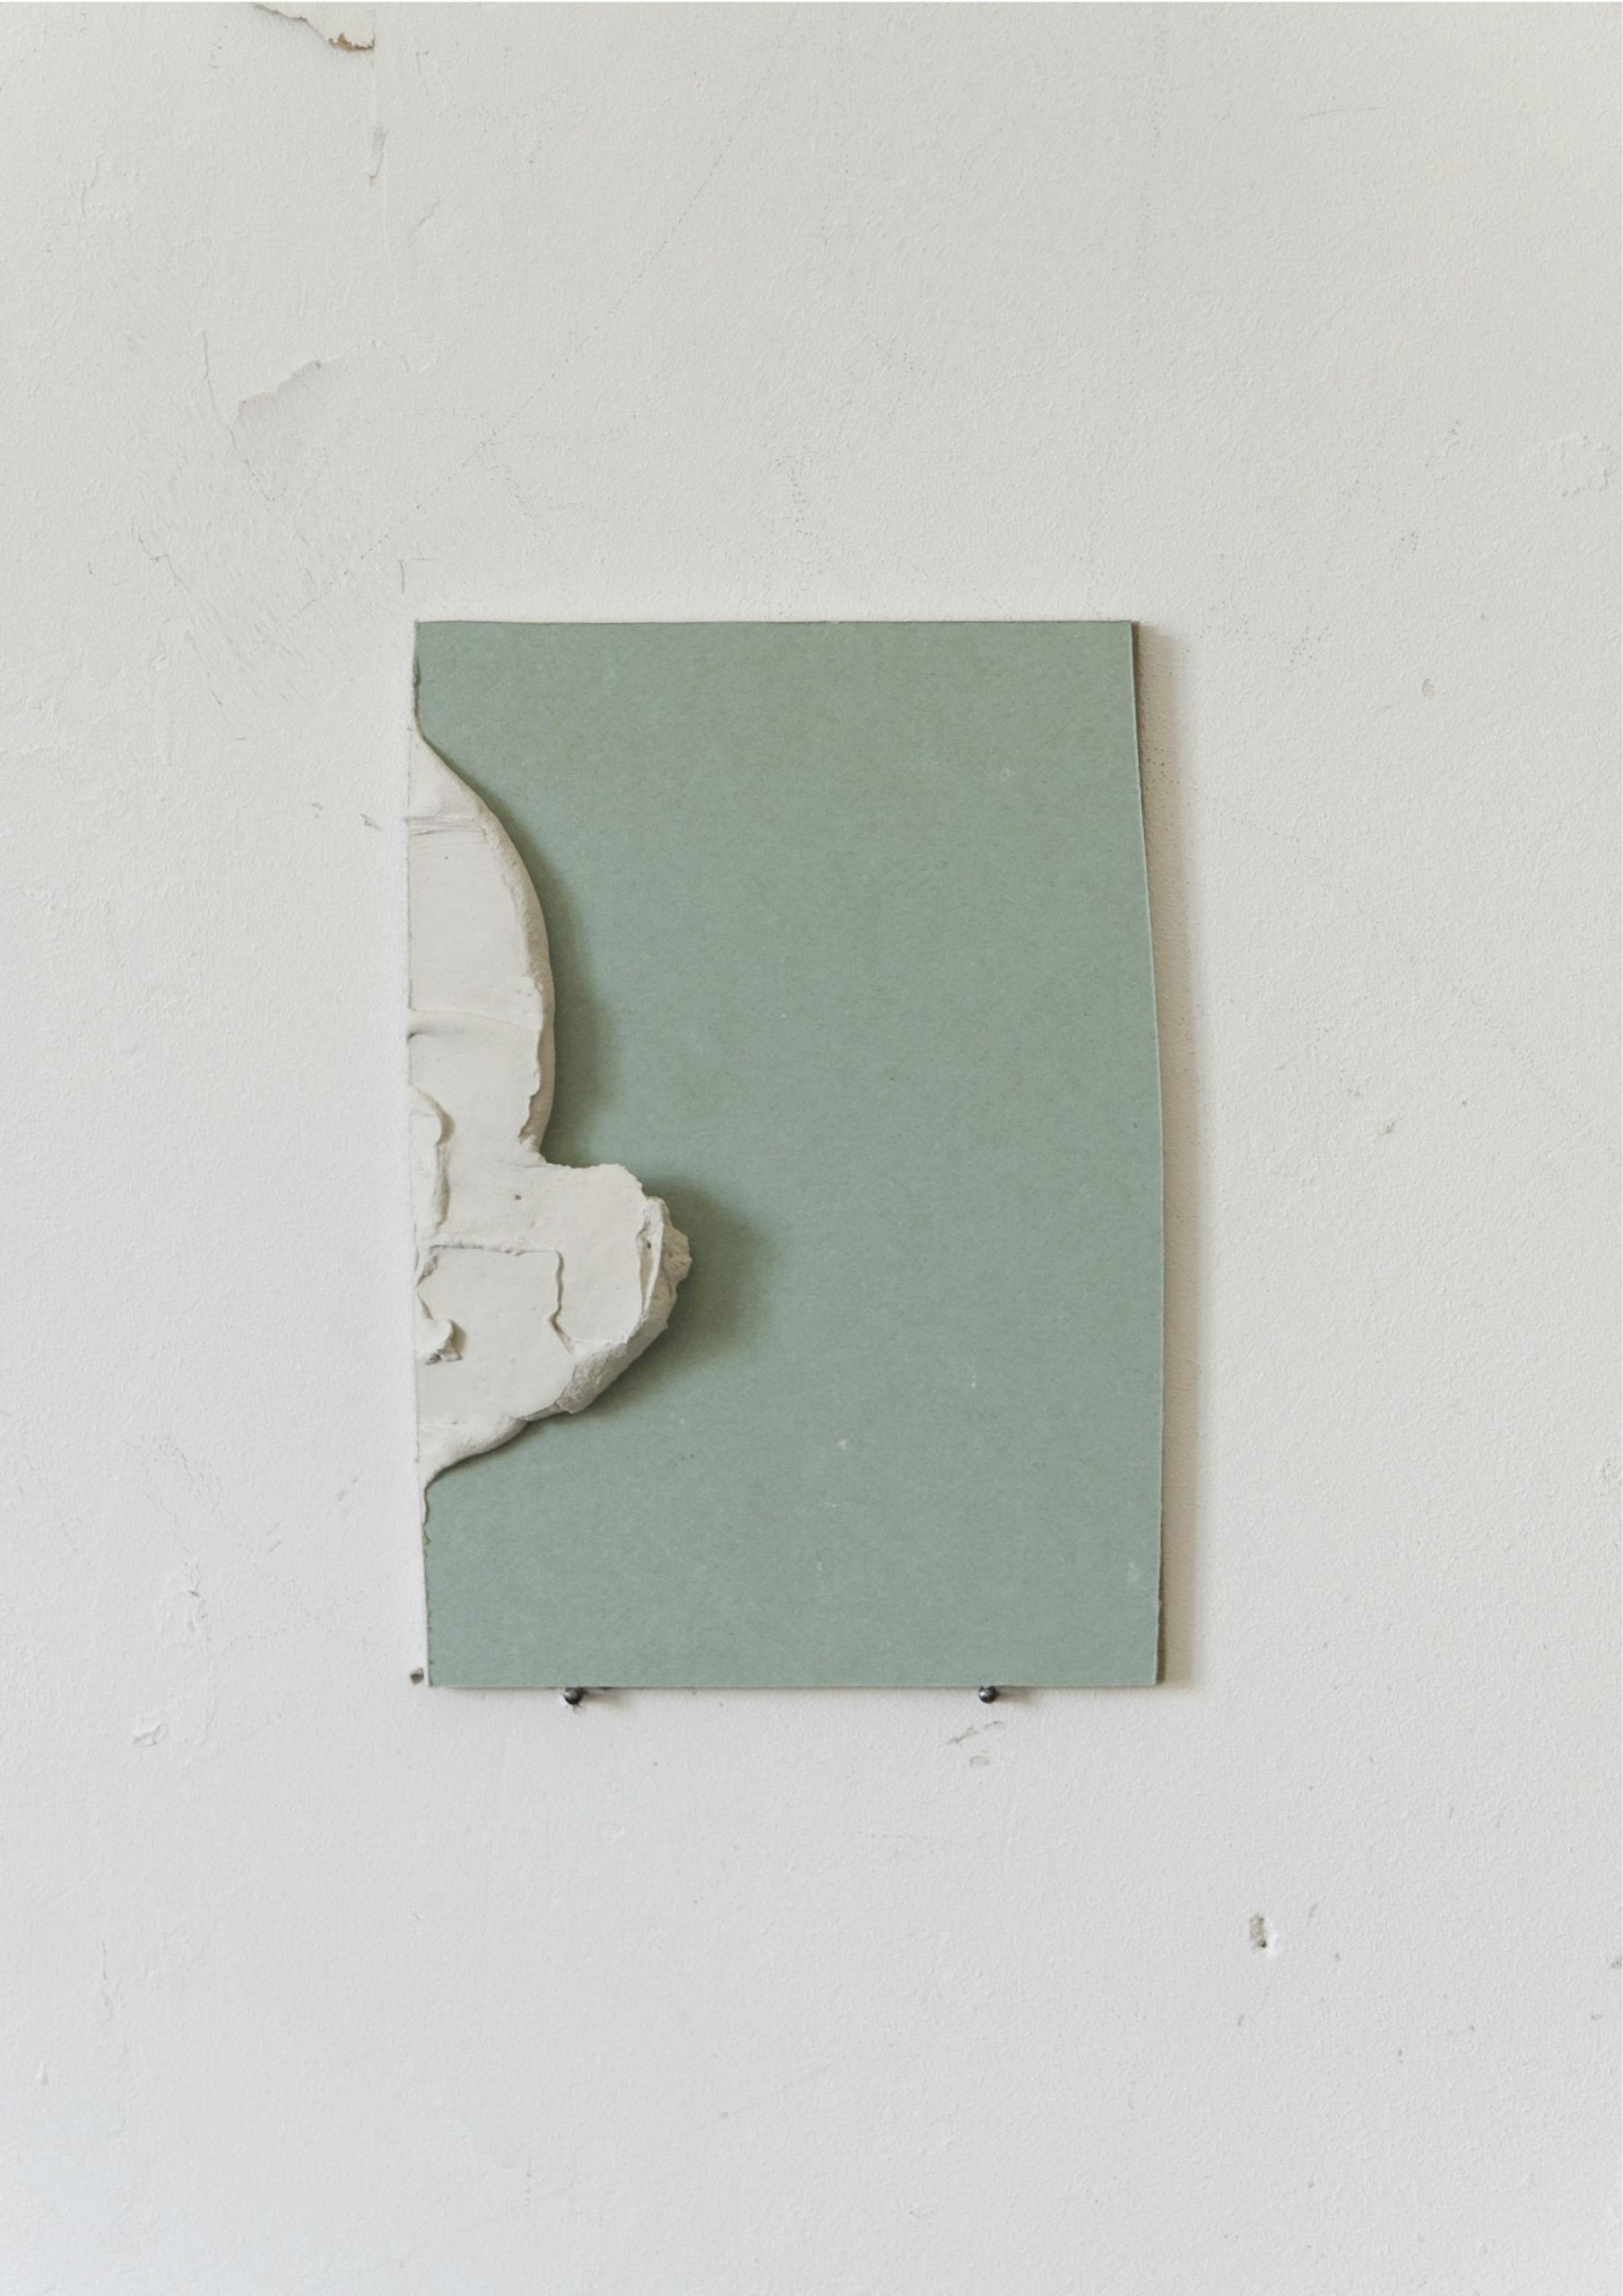 Kriz Olbricht, vesper II, 2015.  Plasterboard, adhesive plaster. 14.5 x 21 cm.